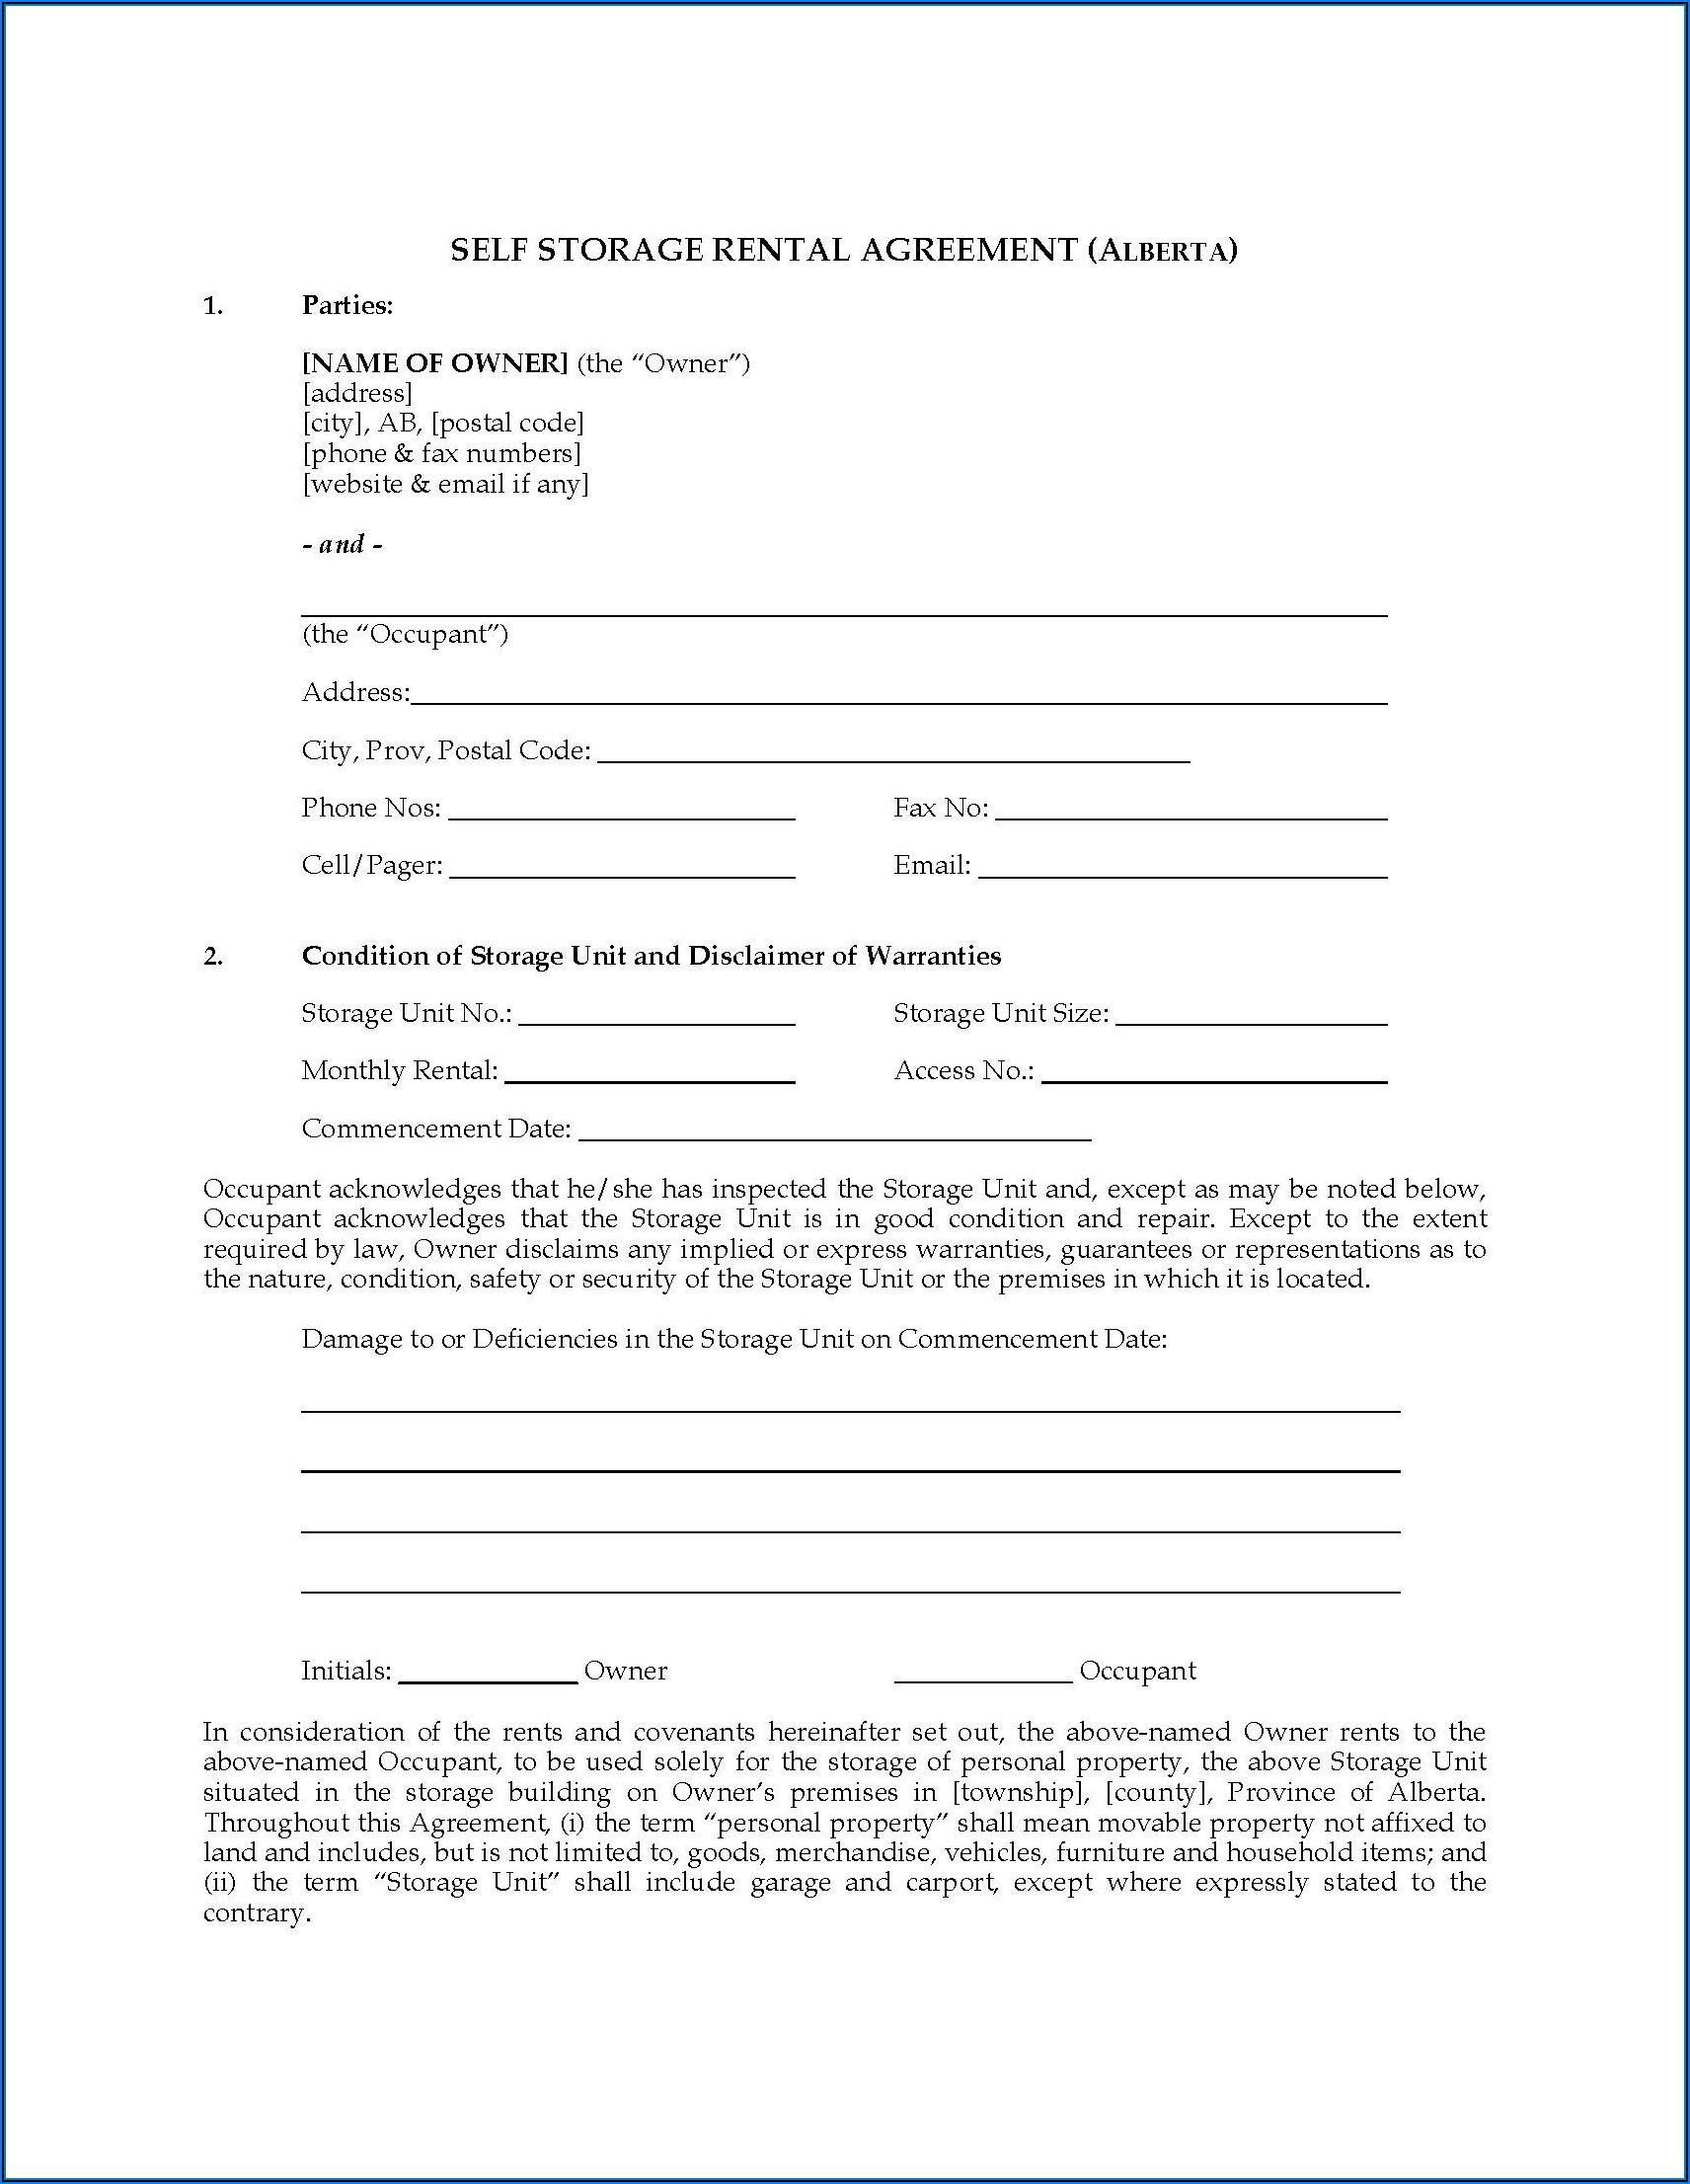 Alberta Rental Agreement Contract